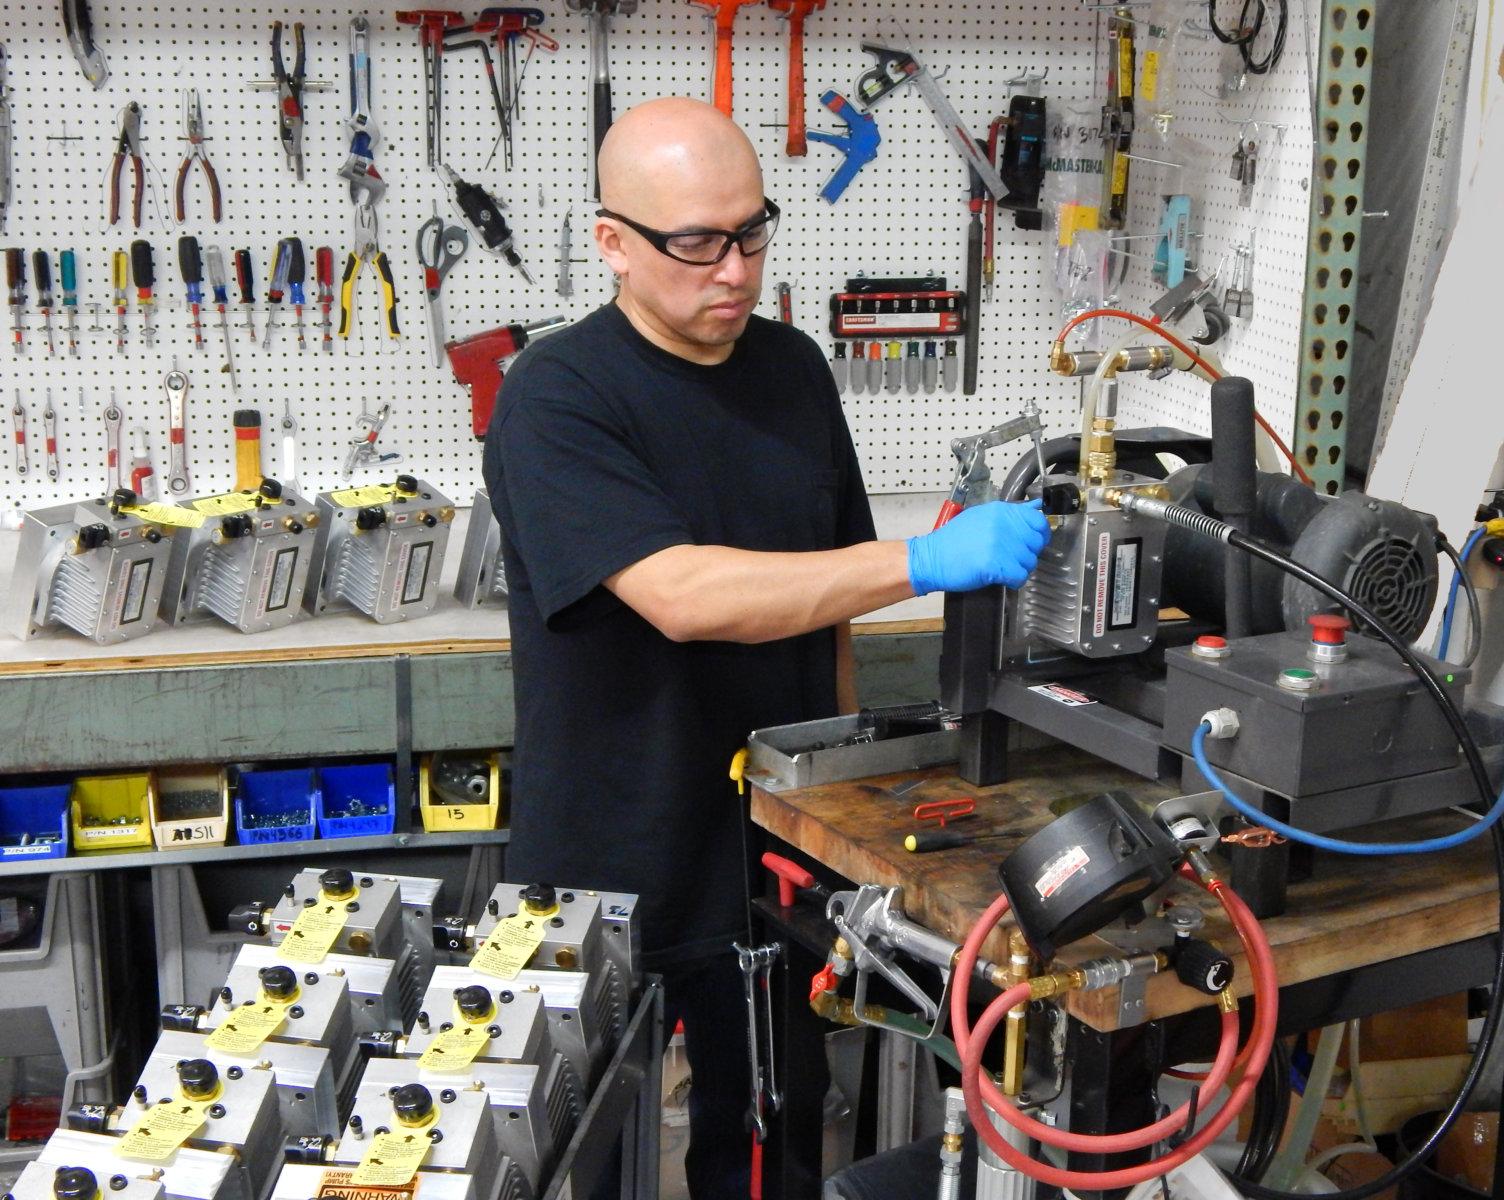 Campbell Hausfeld Airless Spray Pump production